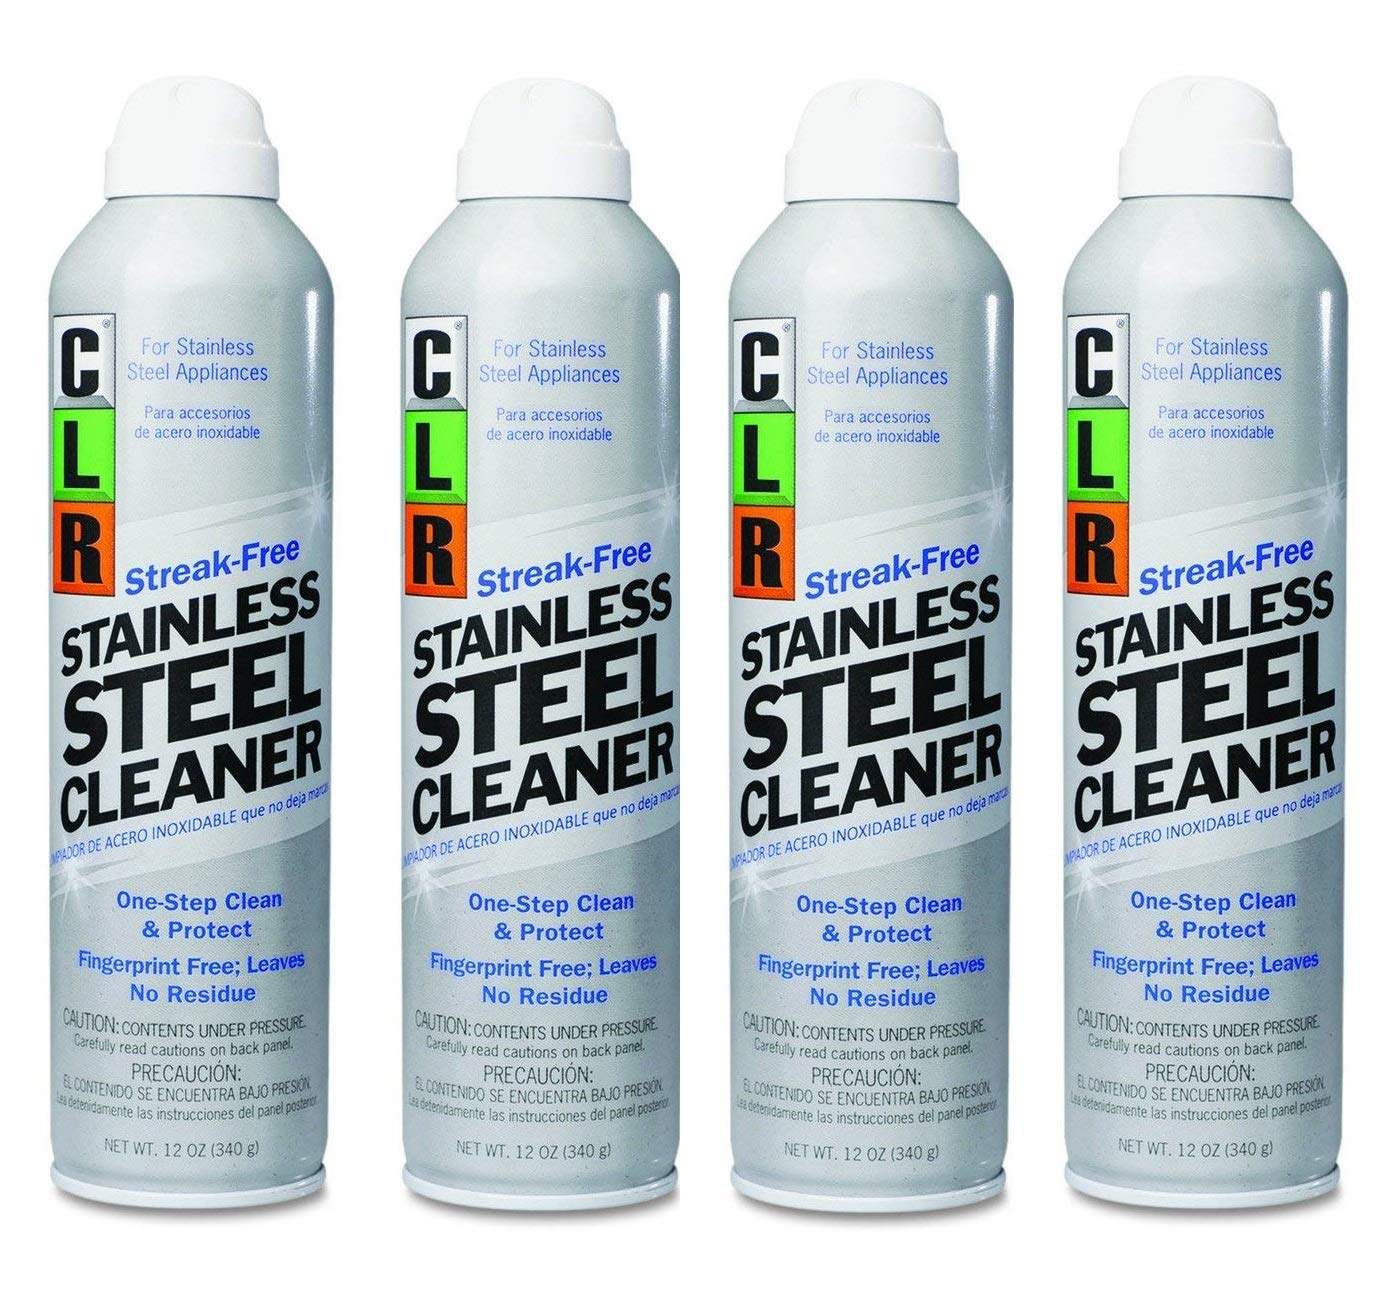 Amazon.com: CLR CSS-12 Stainless Steel Cleaner, Citrus, 12 oz ...